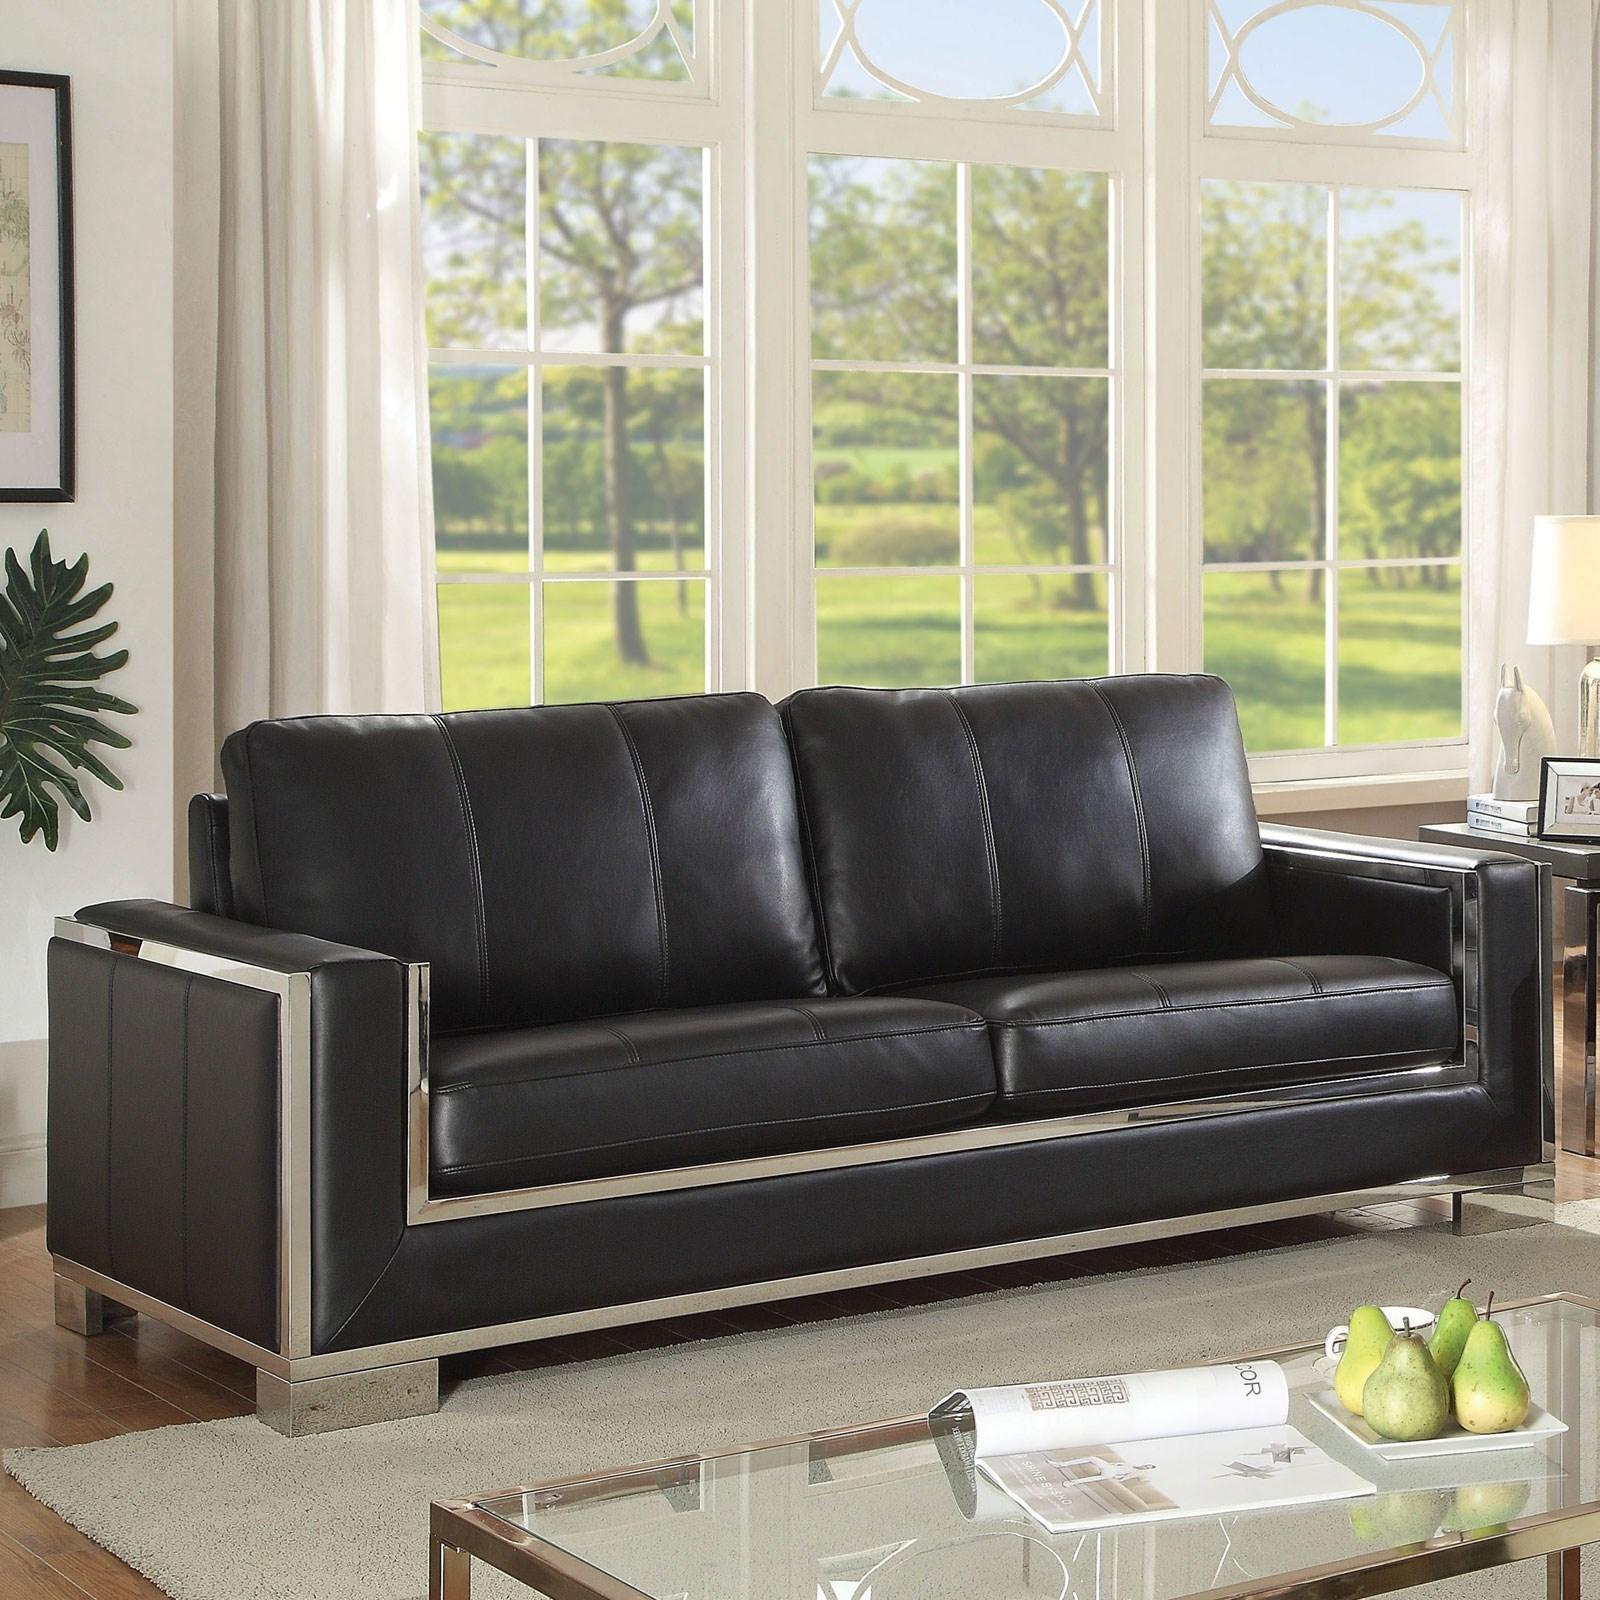 Monika Contemporary Sofa by Furniture of America at Dream Home Interiors